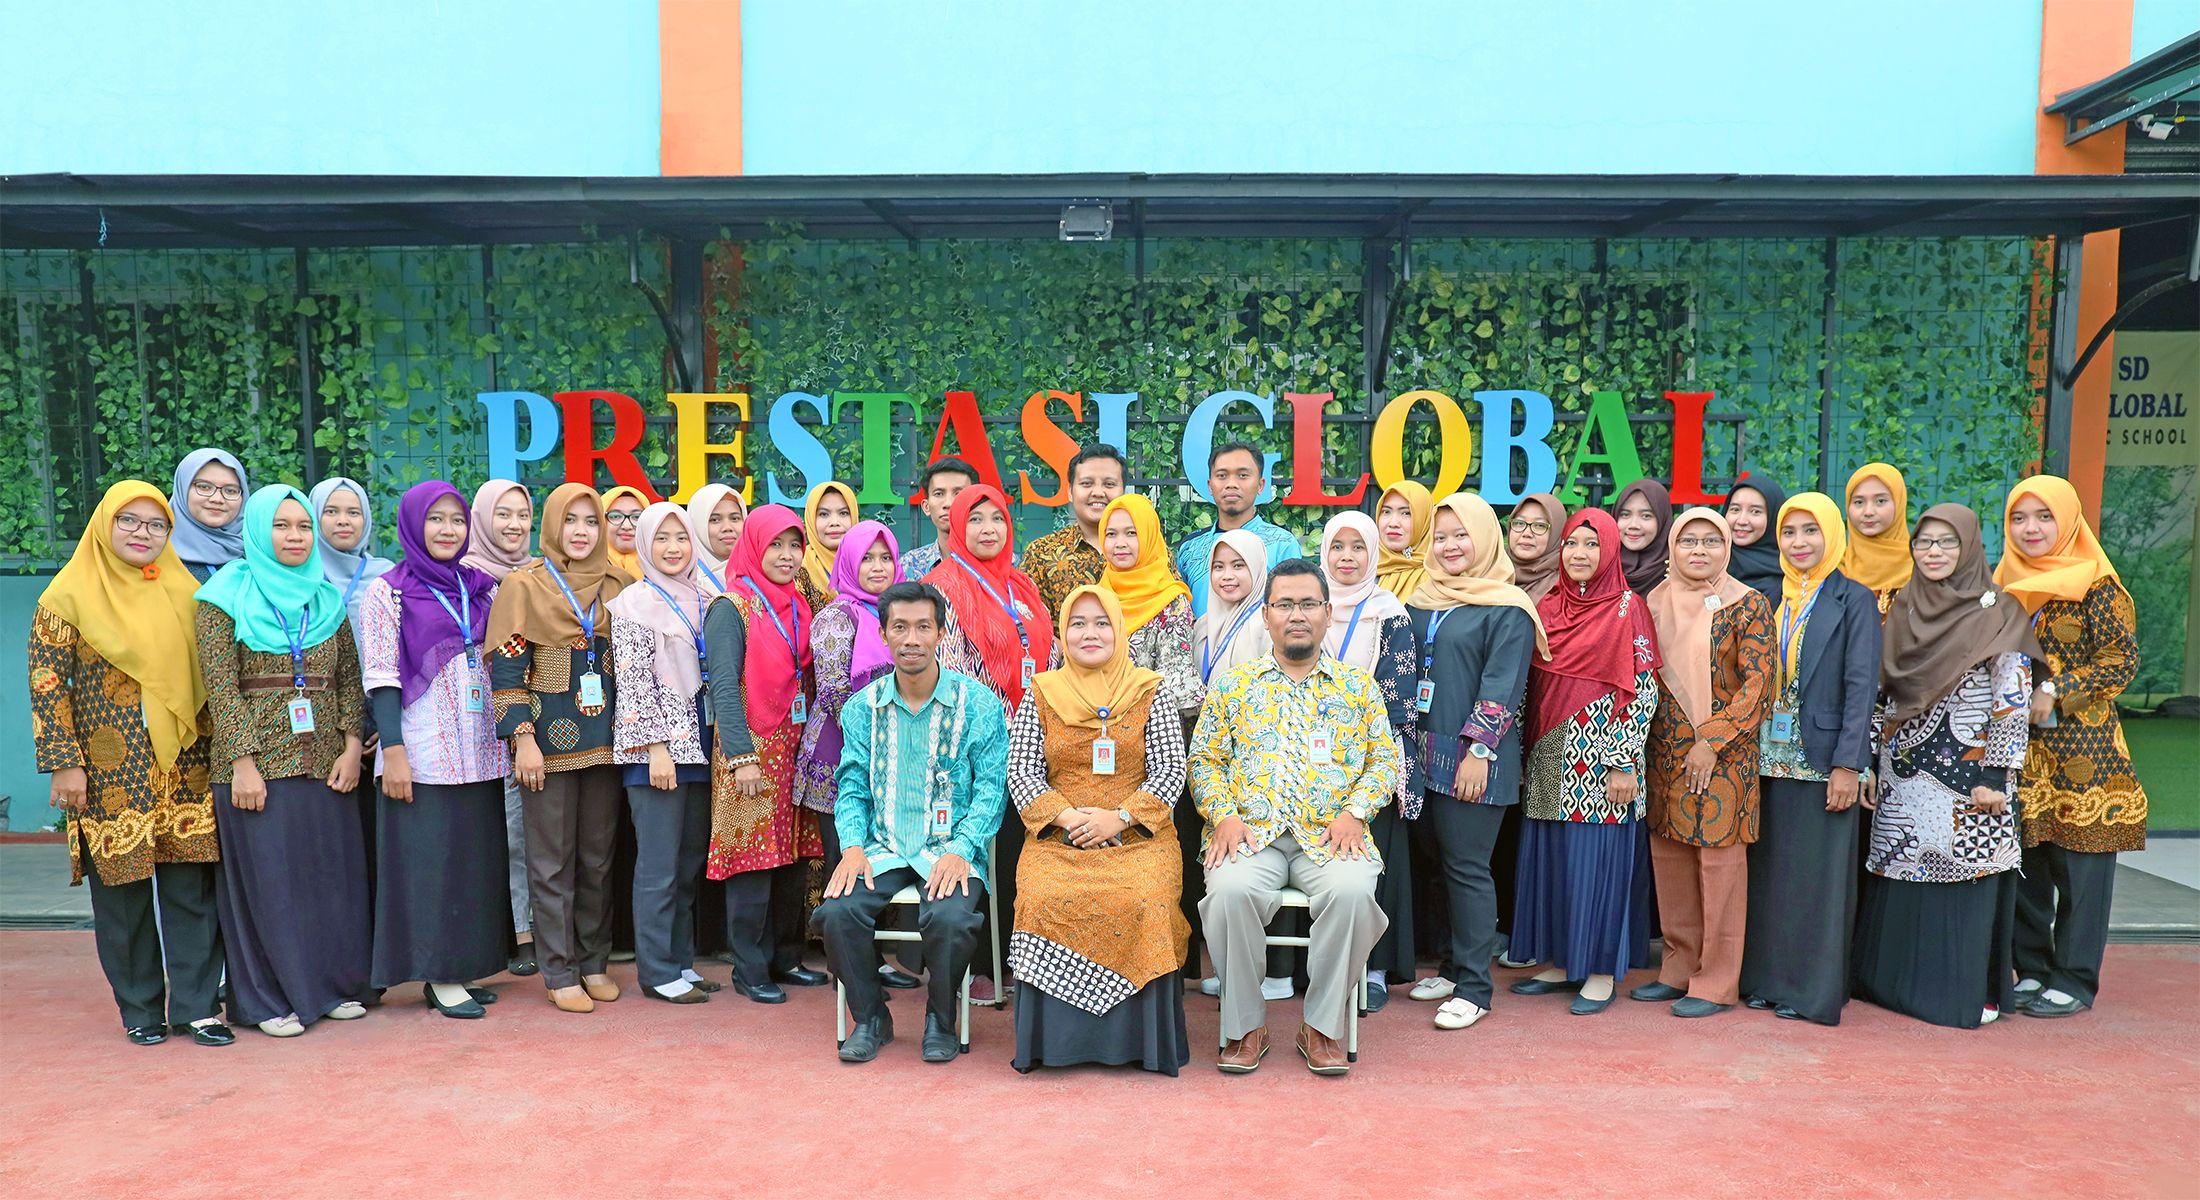 sekolah prestasi global